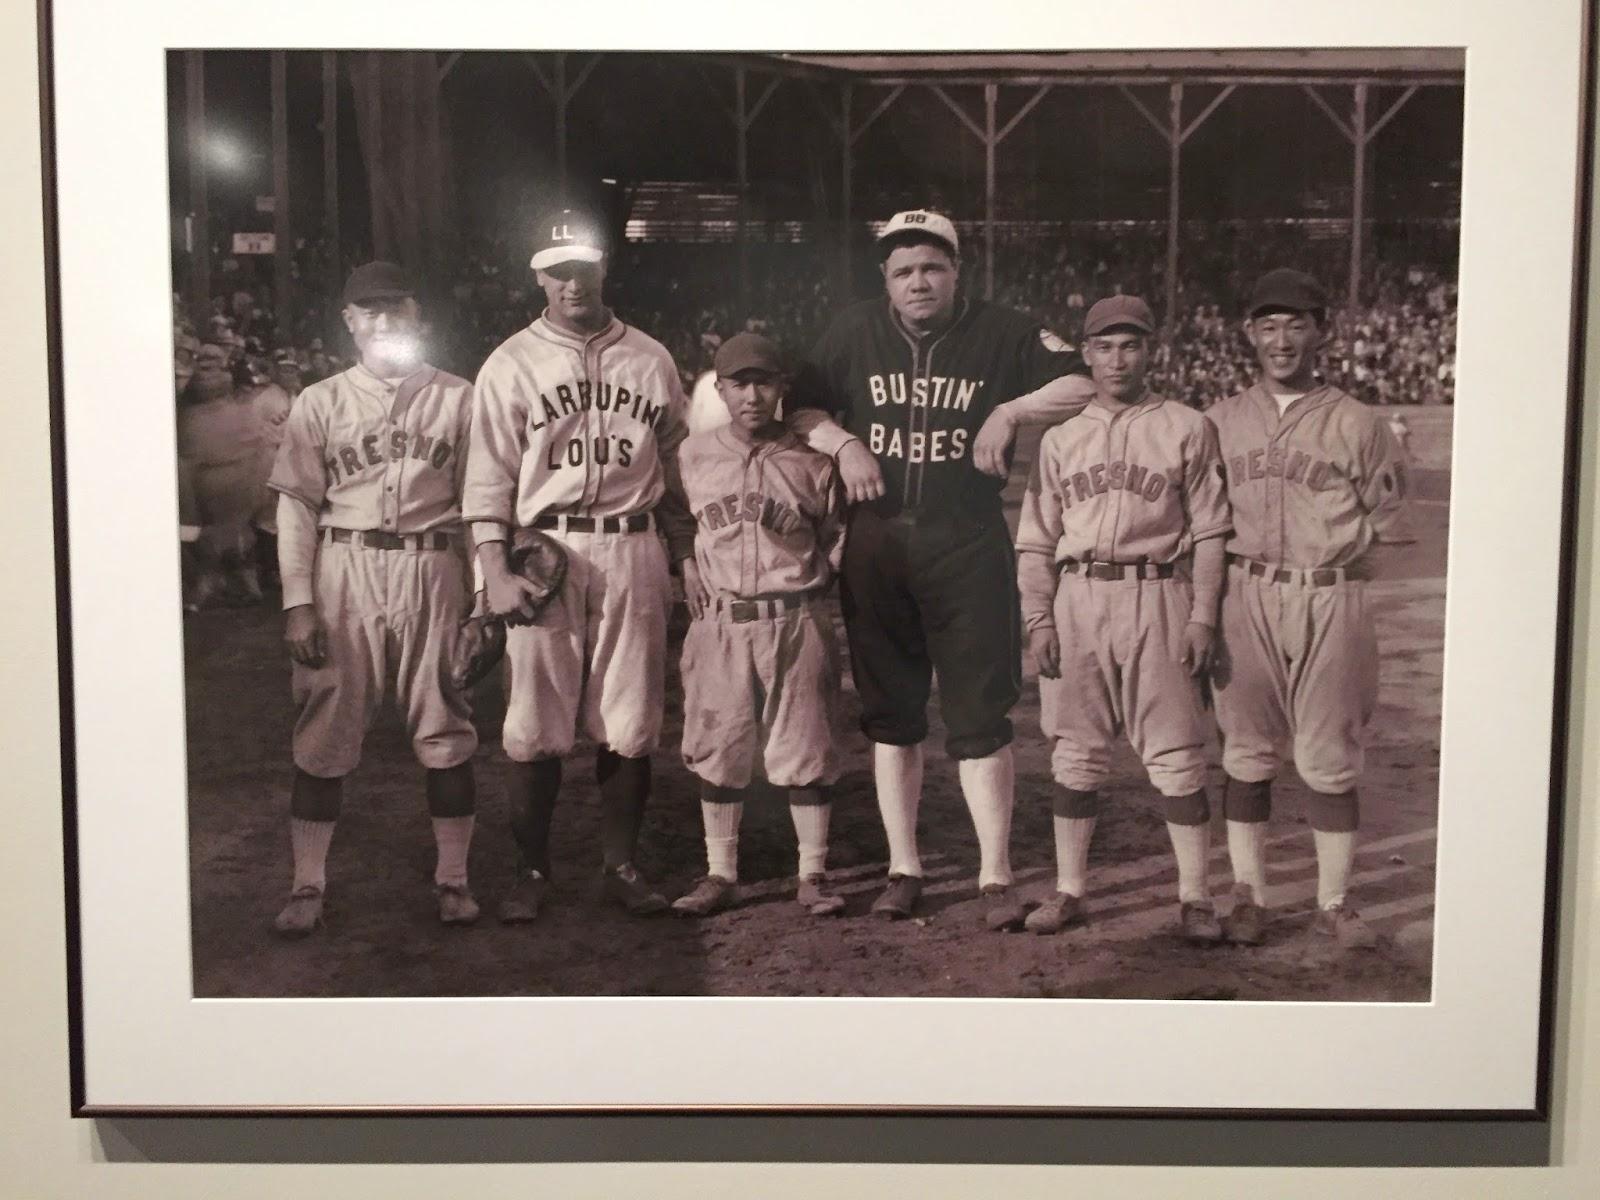 Barnstormers, Bustin Babes, Laurapin Lous, 1927 Barnstorming